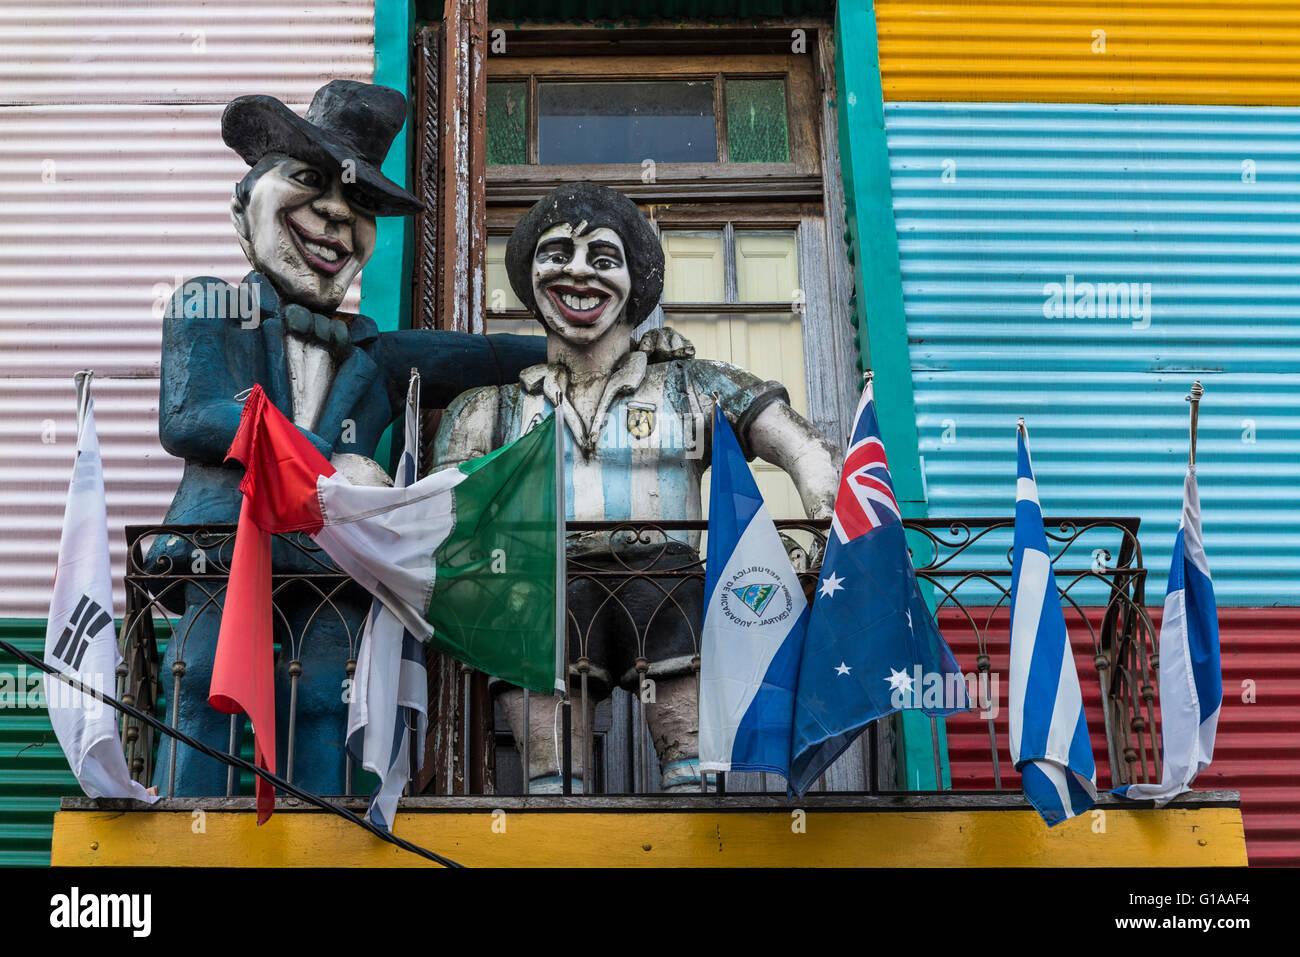 Diego Maradona, Brightly painted houses in Caminito, La Boca, Buenos Aires, Argentina - Stock Image